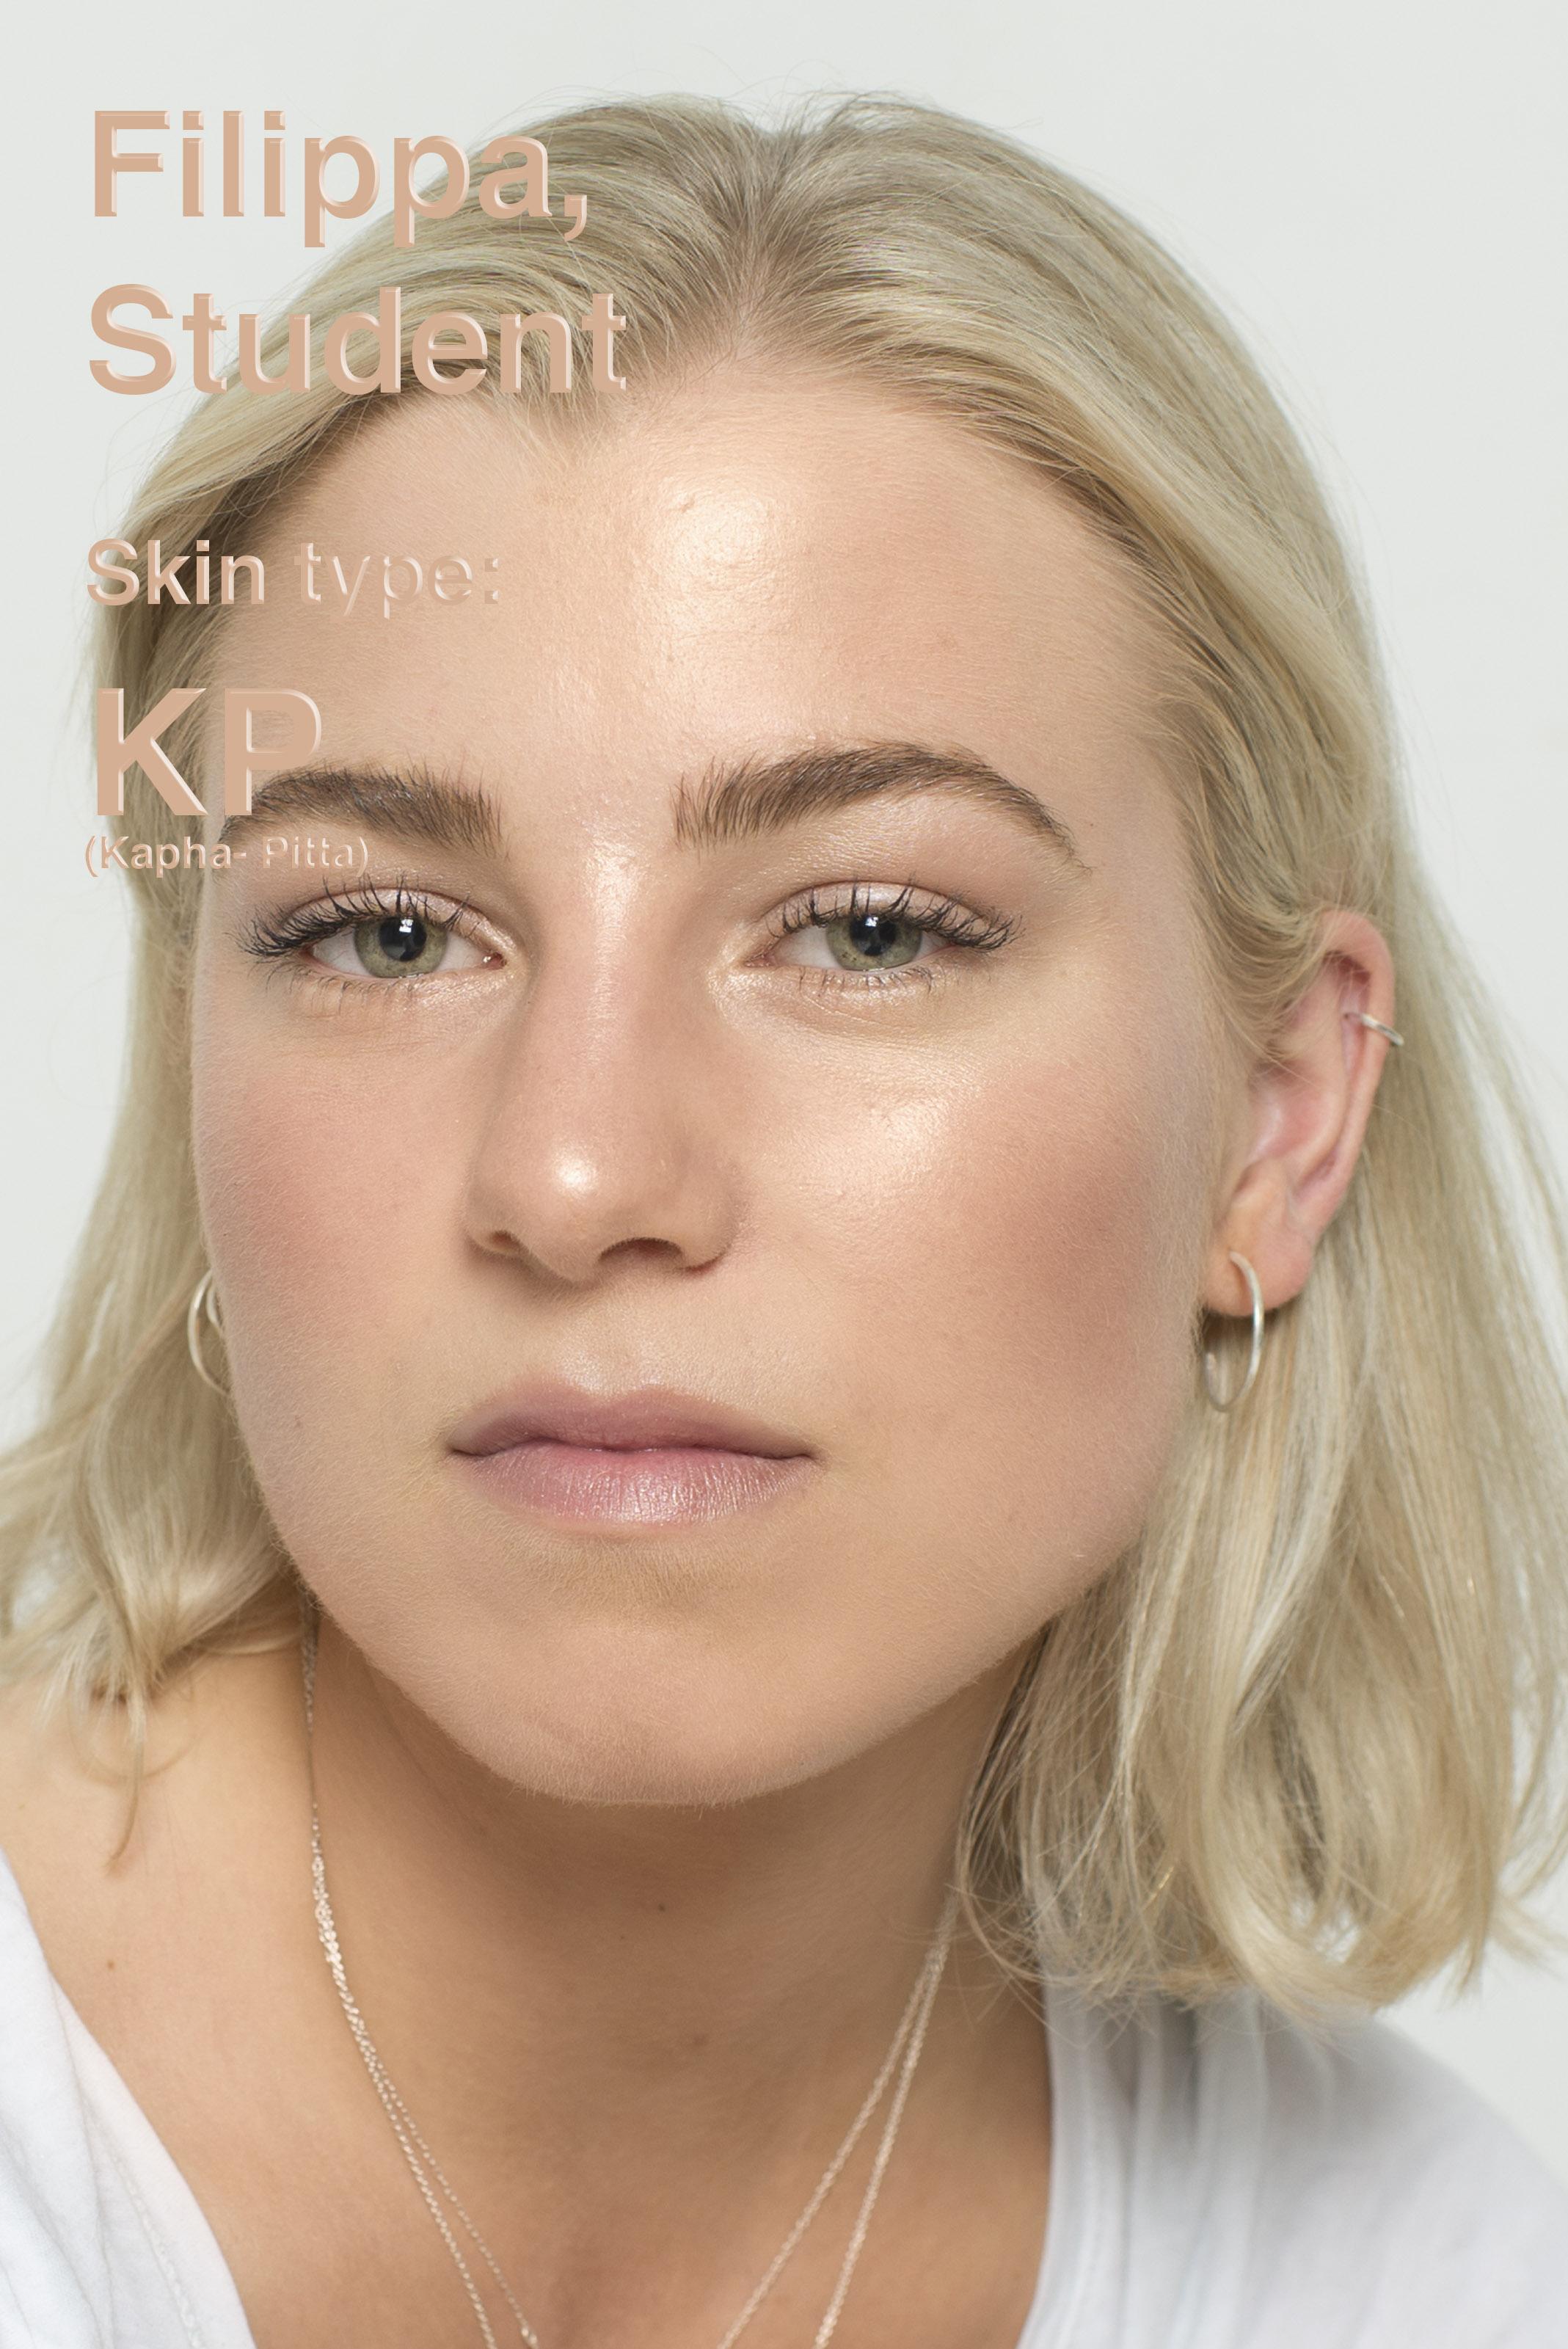 filippa skin type